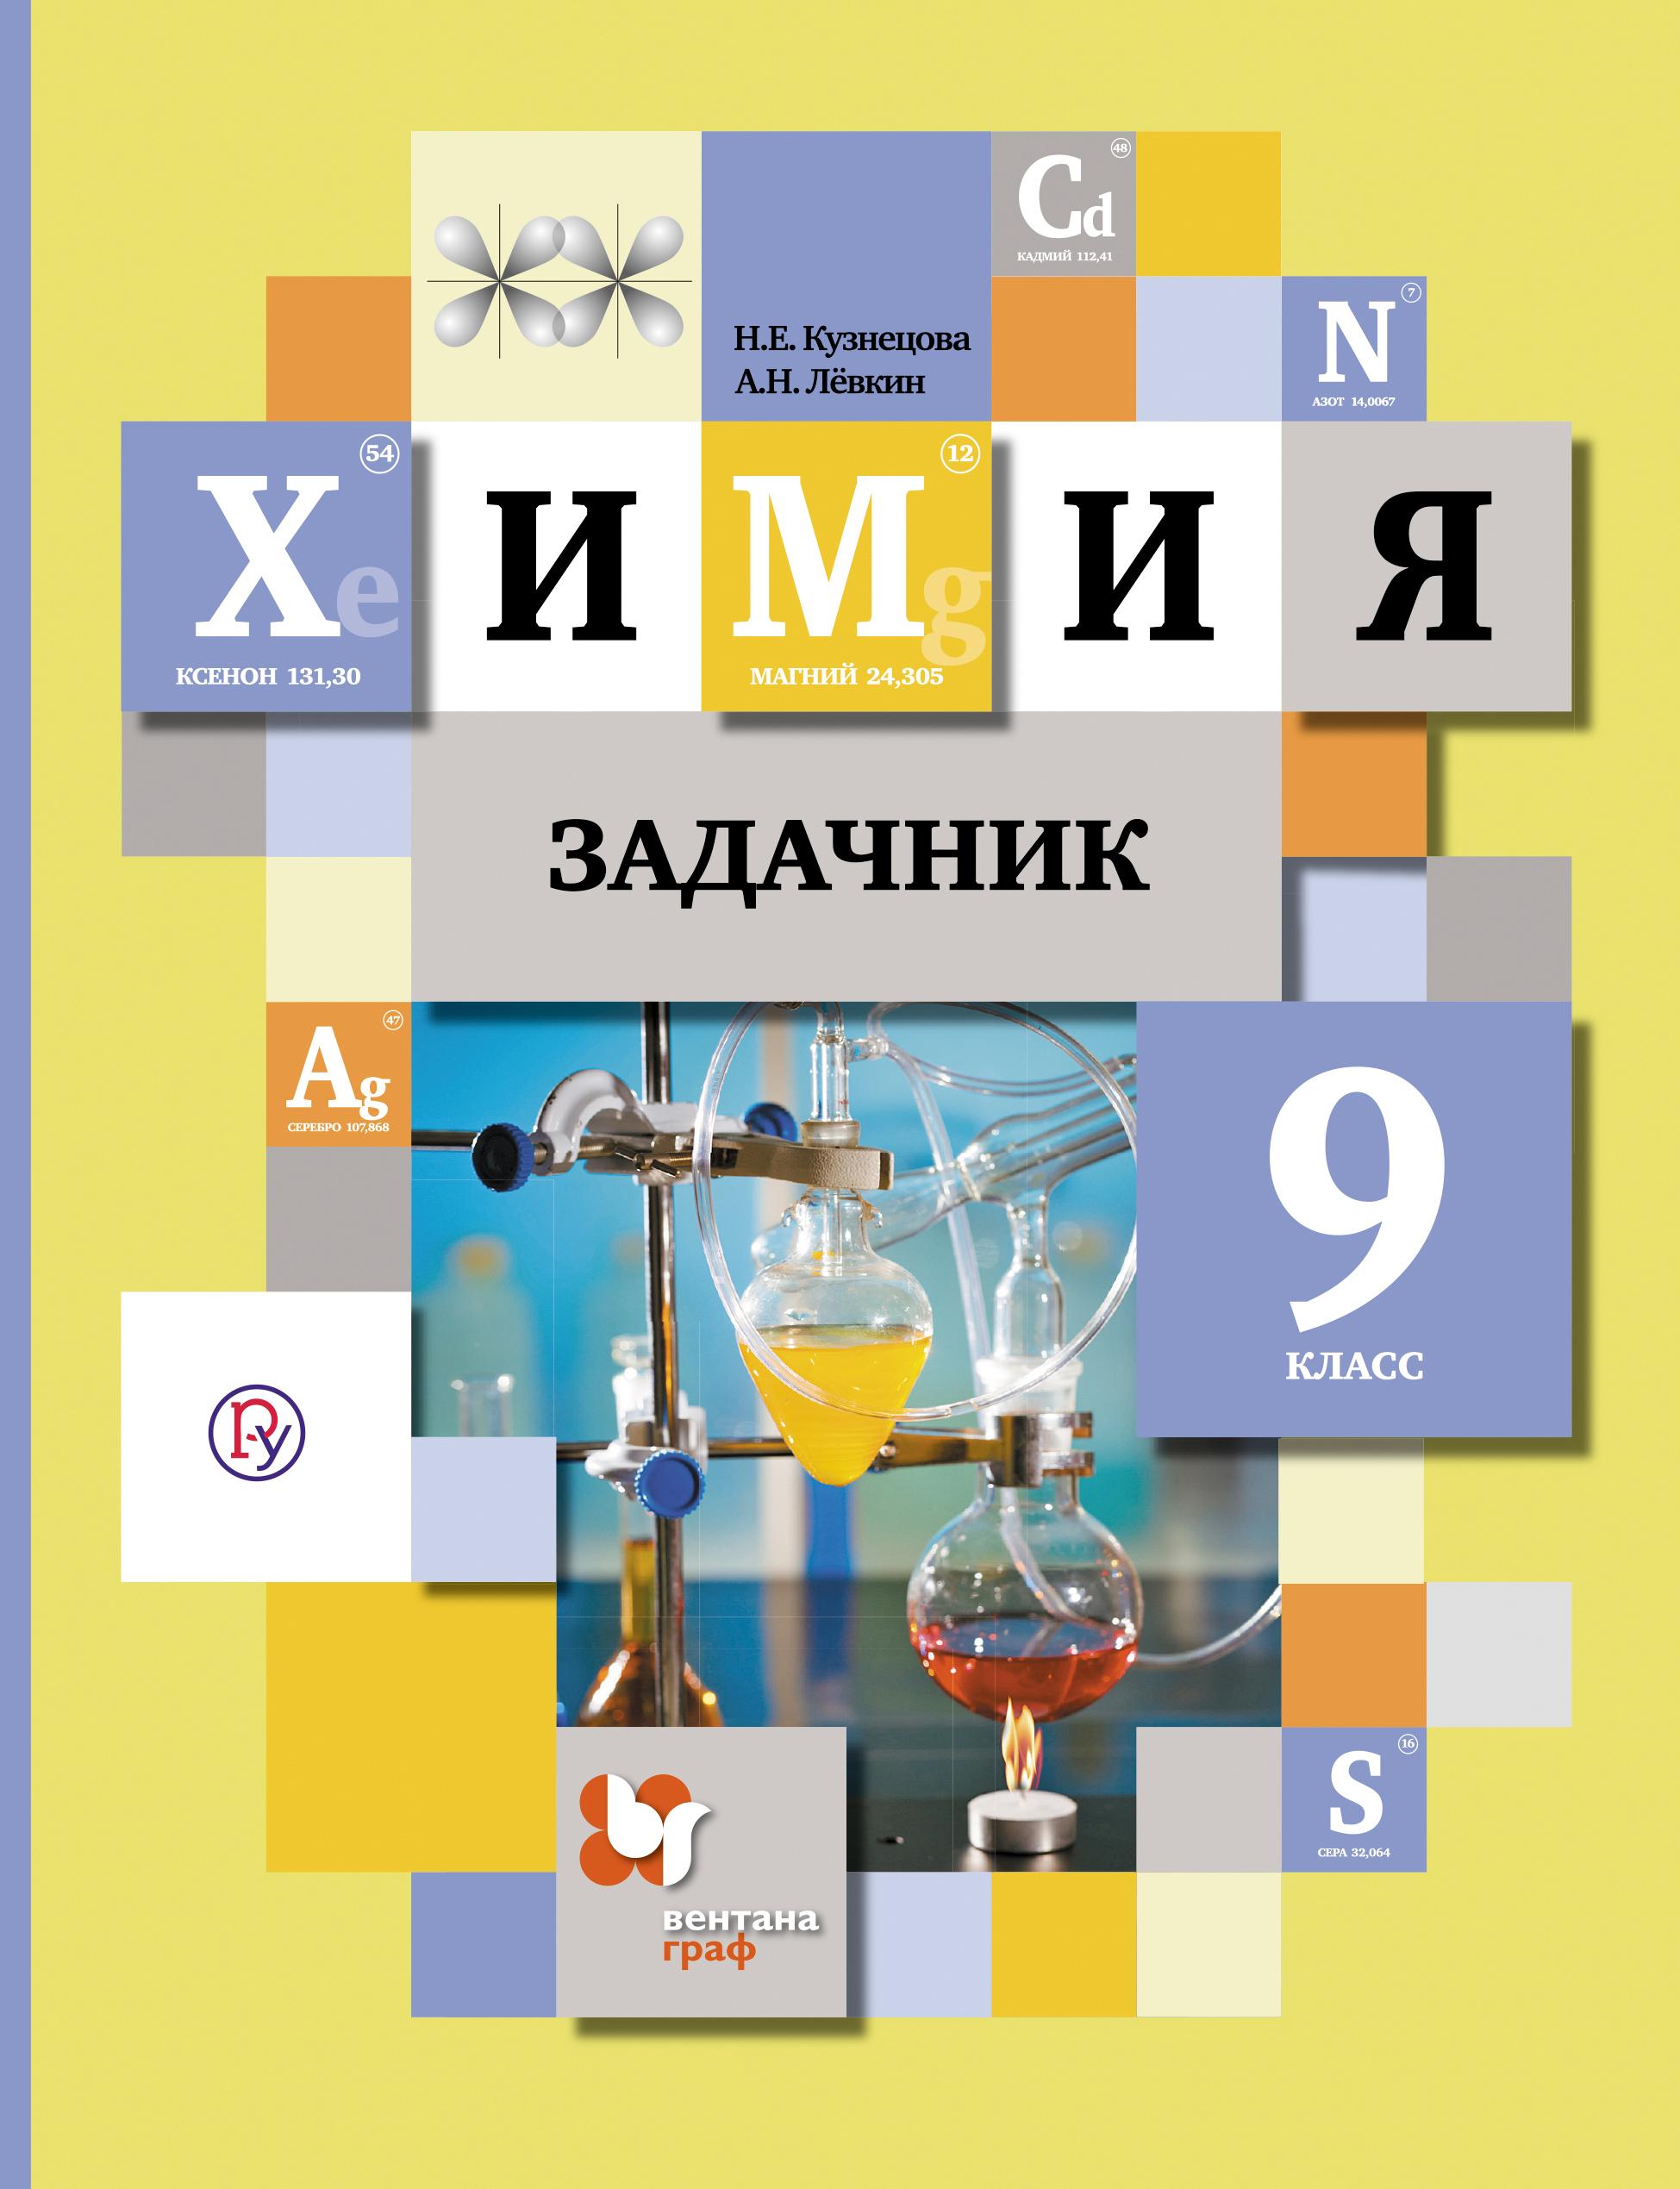 Химия. 9класс. Задачник ( Кузнецова Н.Е., Левкин А.Н.  )